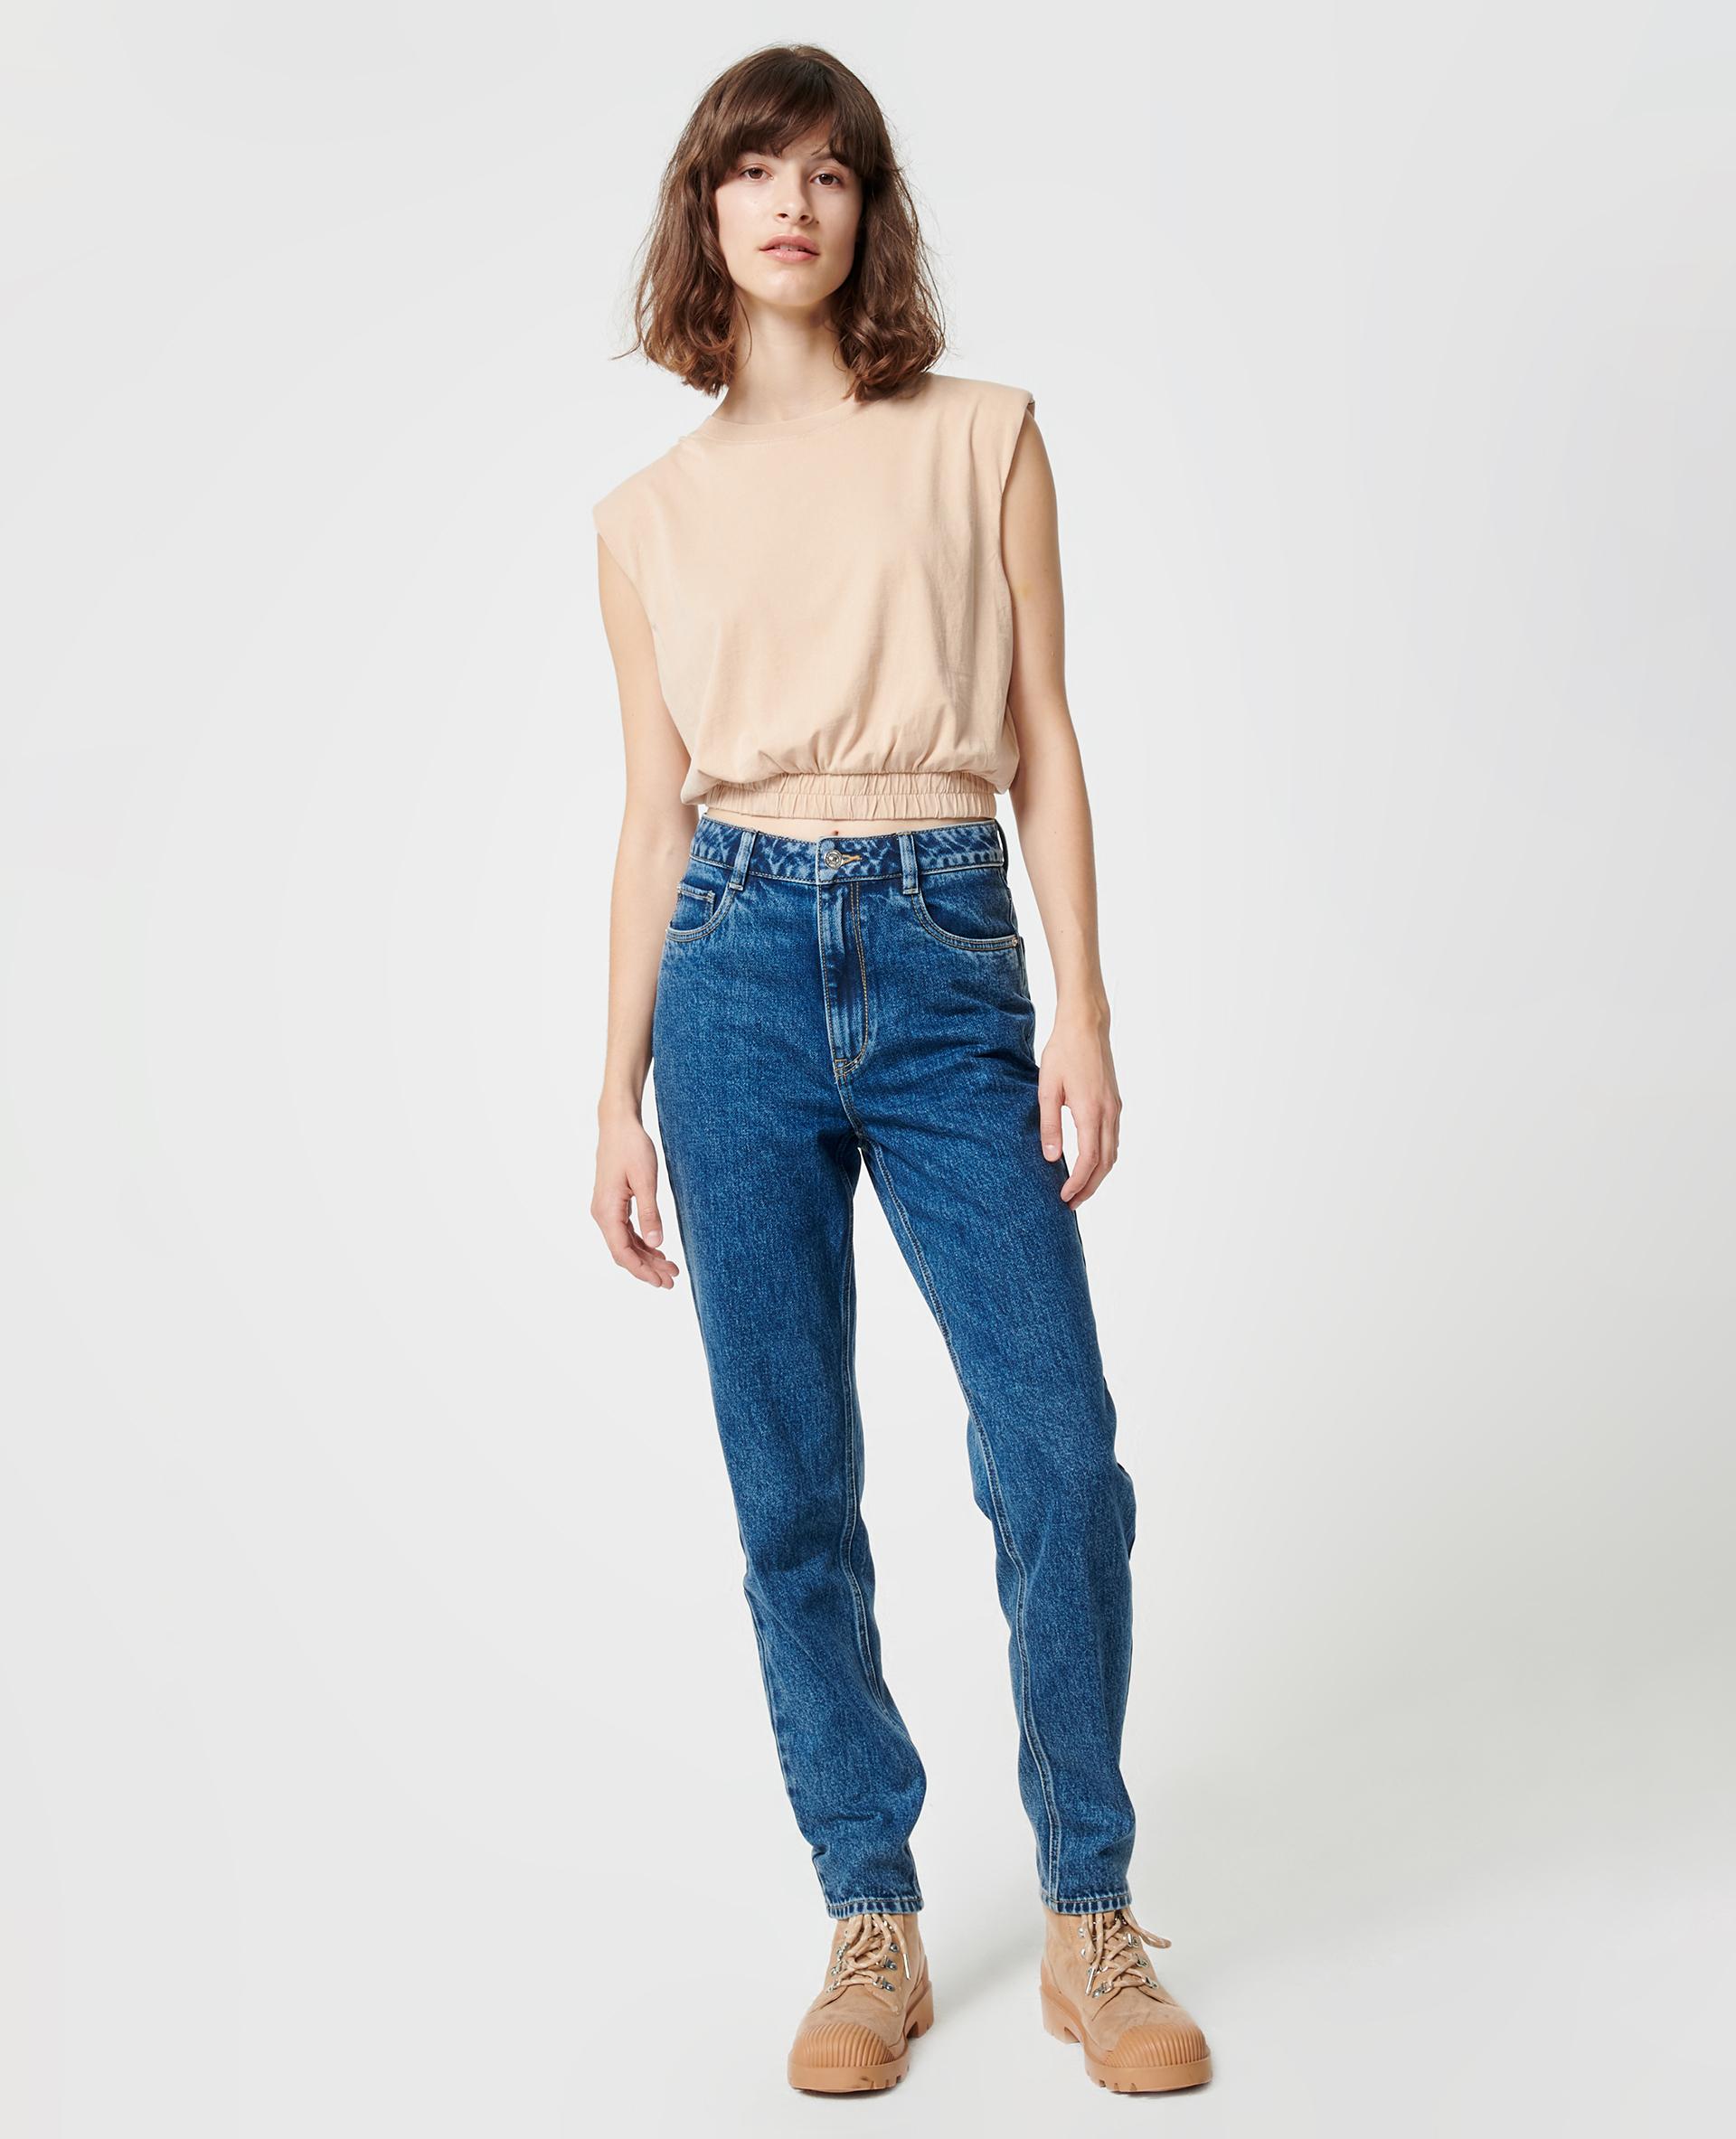 Jeans met hoge taille denimblauw - Pimkie